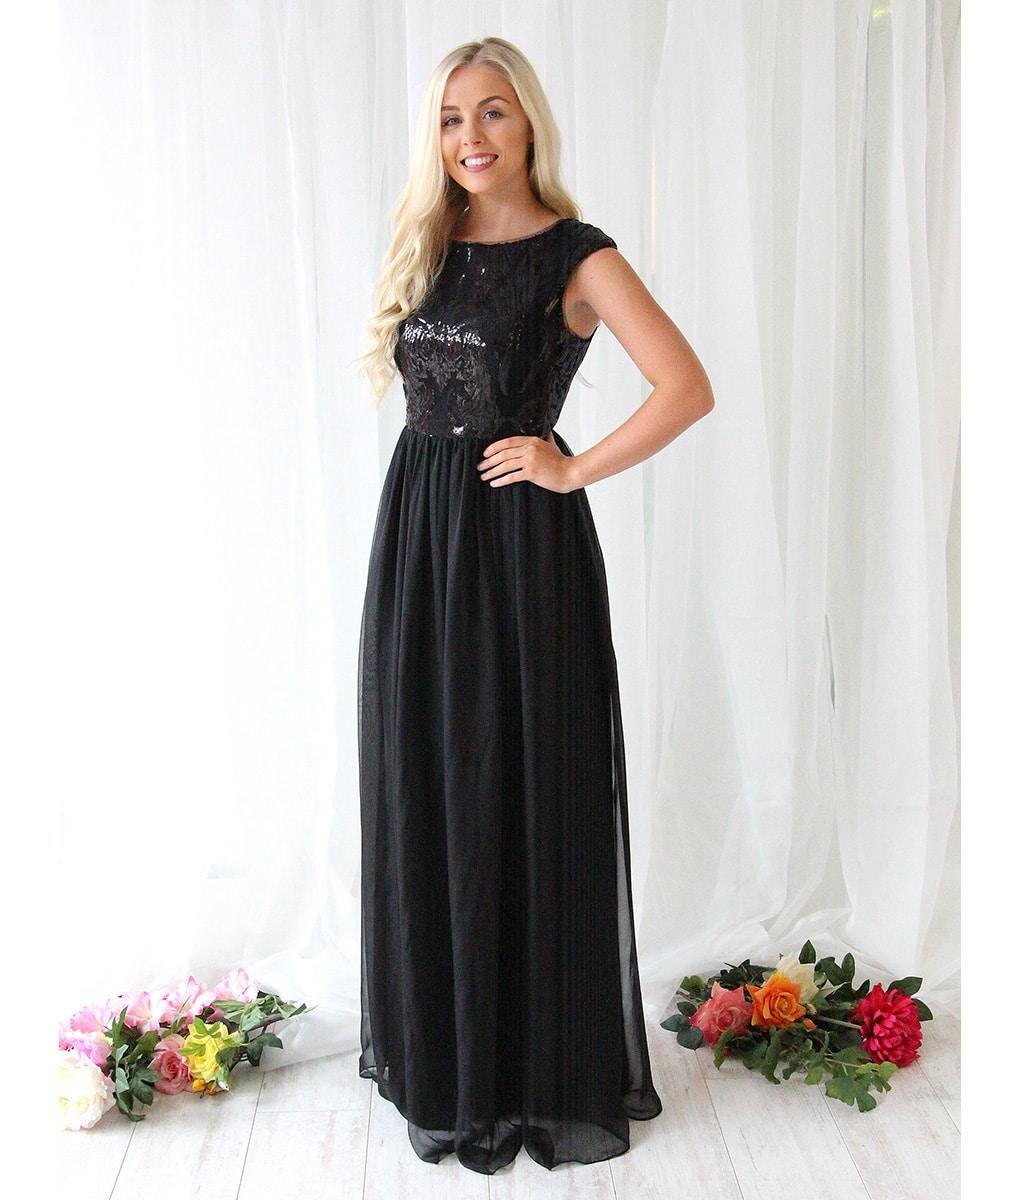 Alila-Black-Sequin-Chiffon-Debs-Dress-Bariano